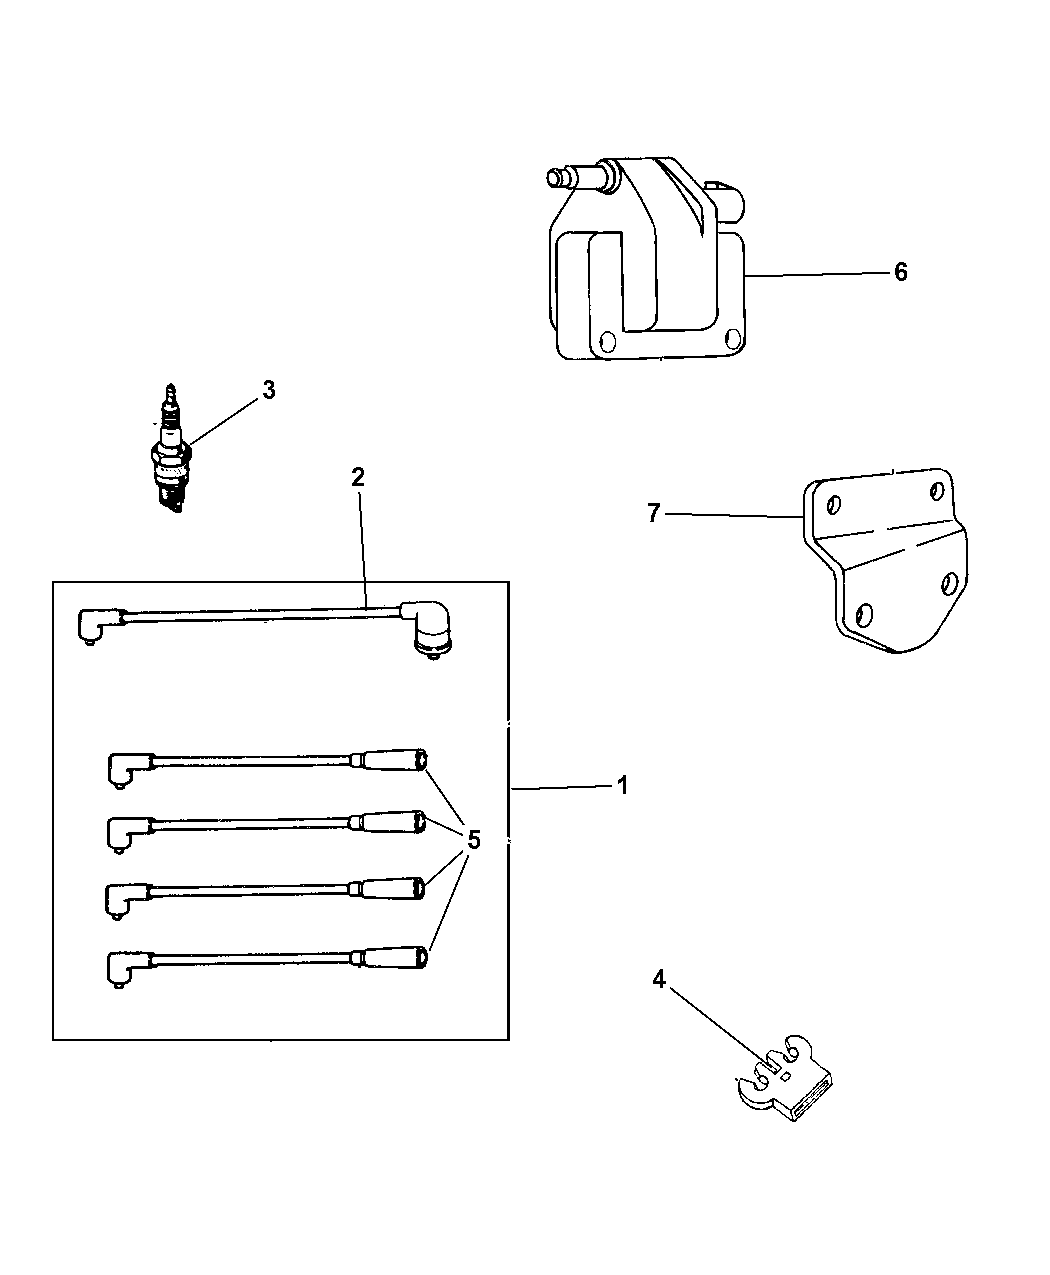 1999 Jeep Cherokee Cable Spark Plug  U0026 Wires